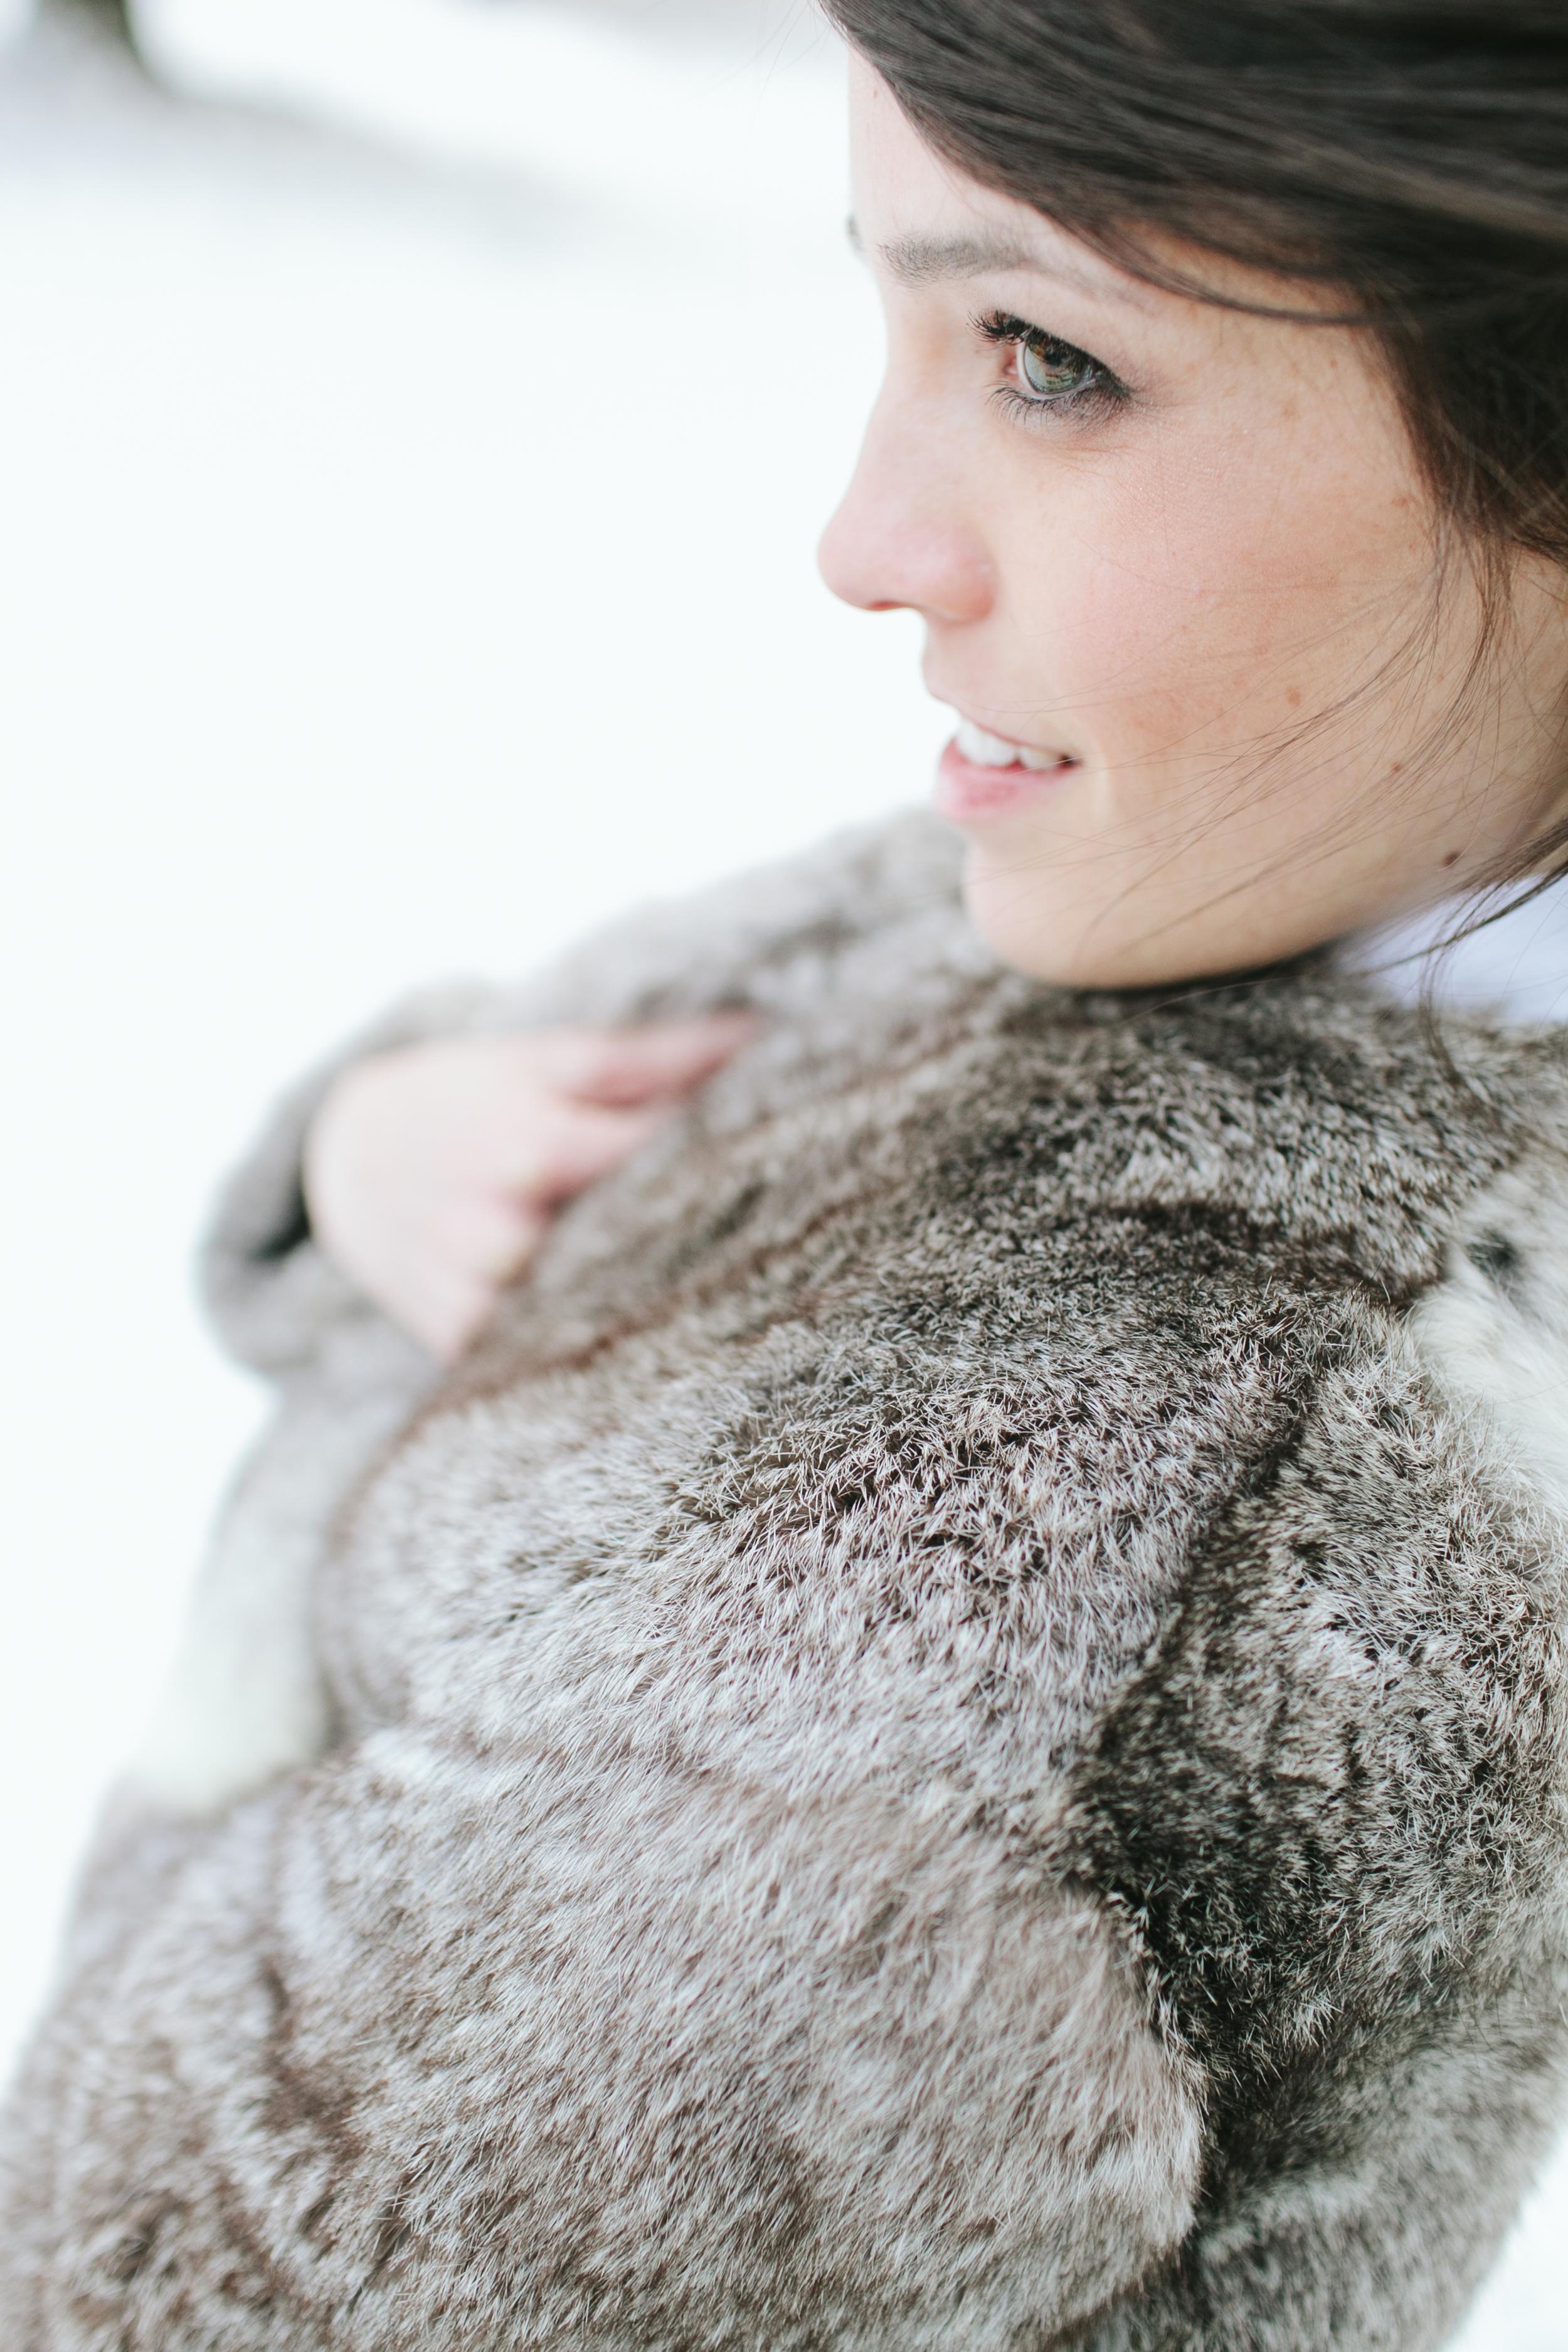 Atlanta-Fashion-Photographer-Kathryn-McCrary-Photography-Snow-Snowlanta-Fur-Coat-15.jpg